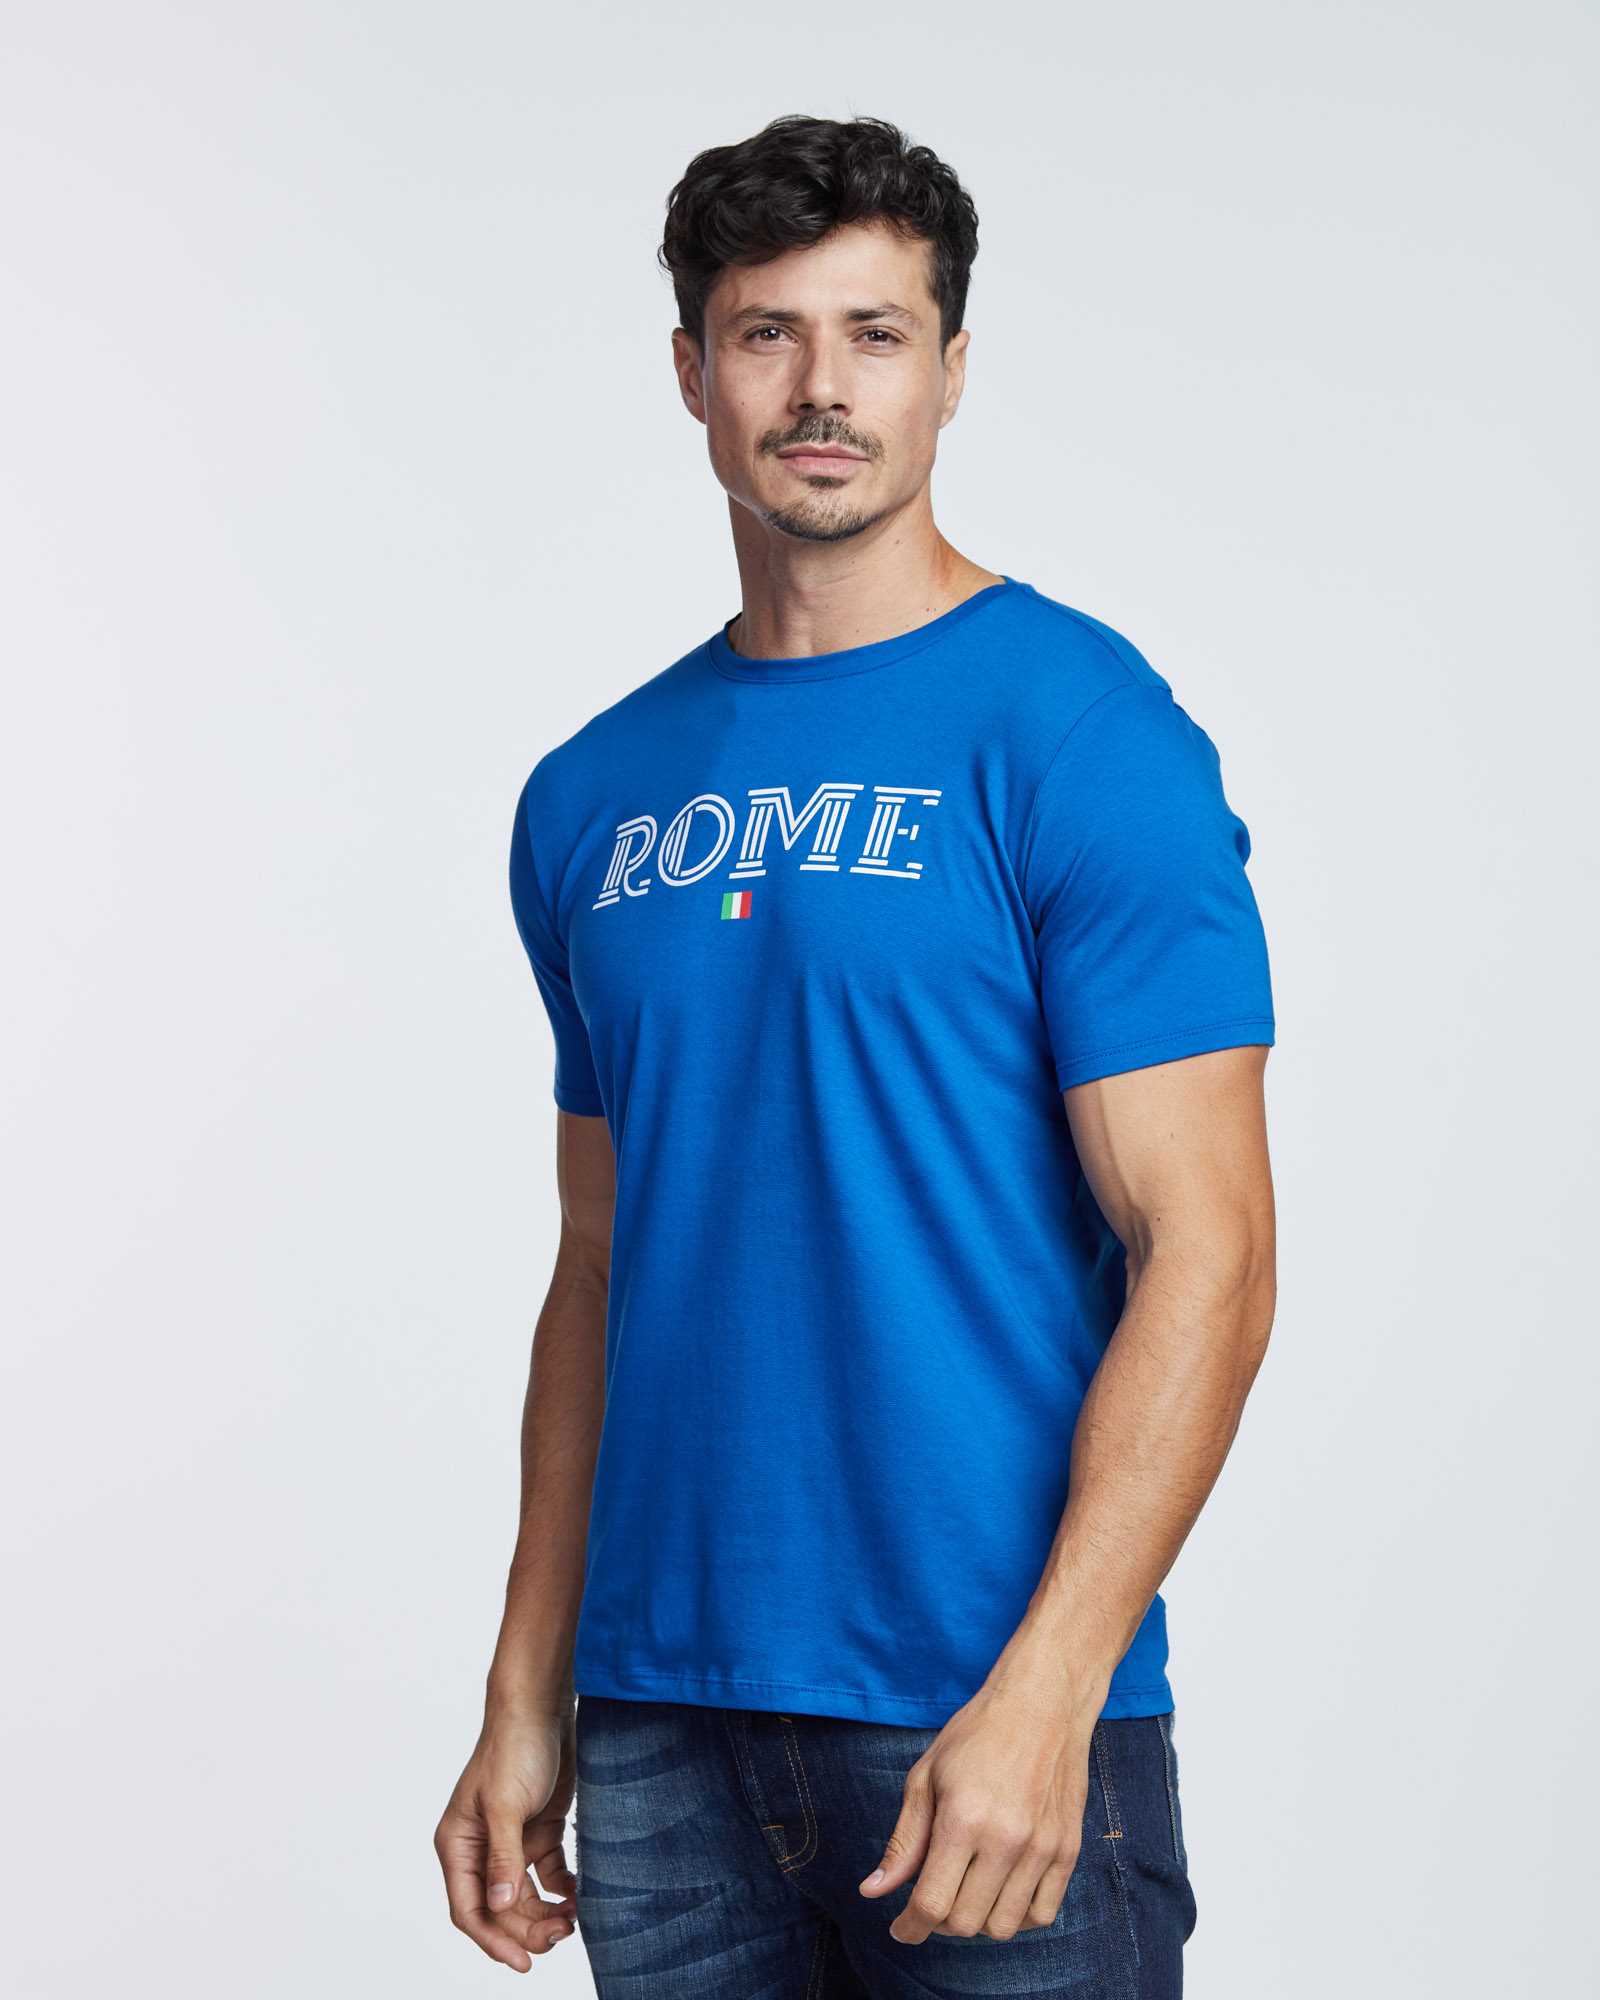 Camiseta Cotton Rome Masculina Evolvee